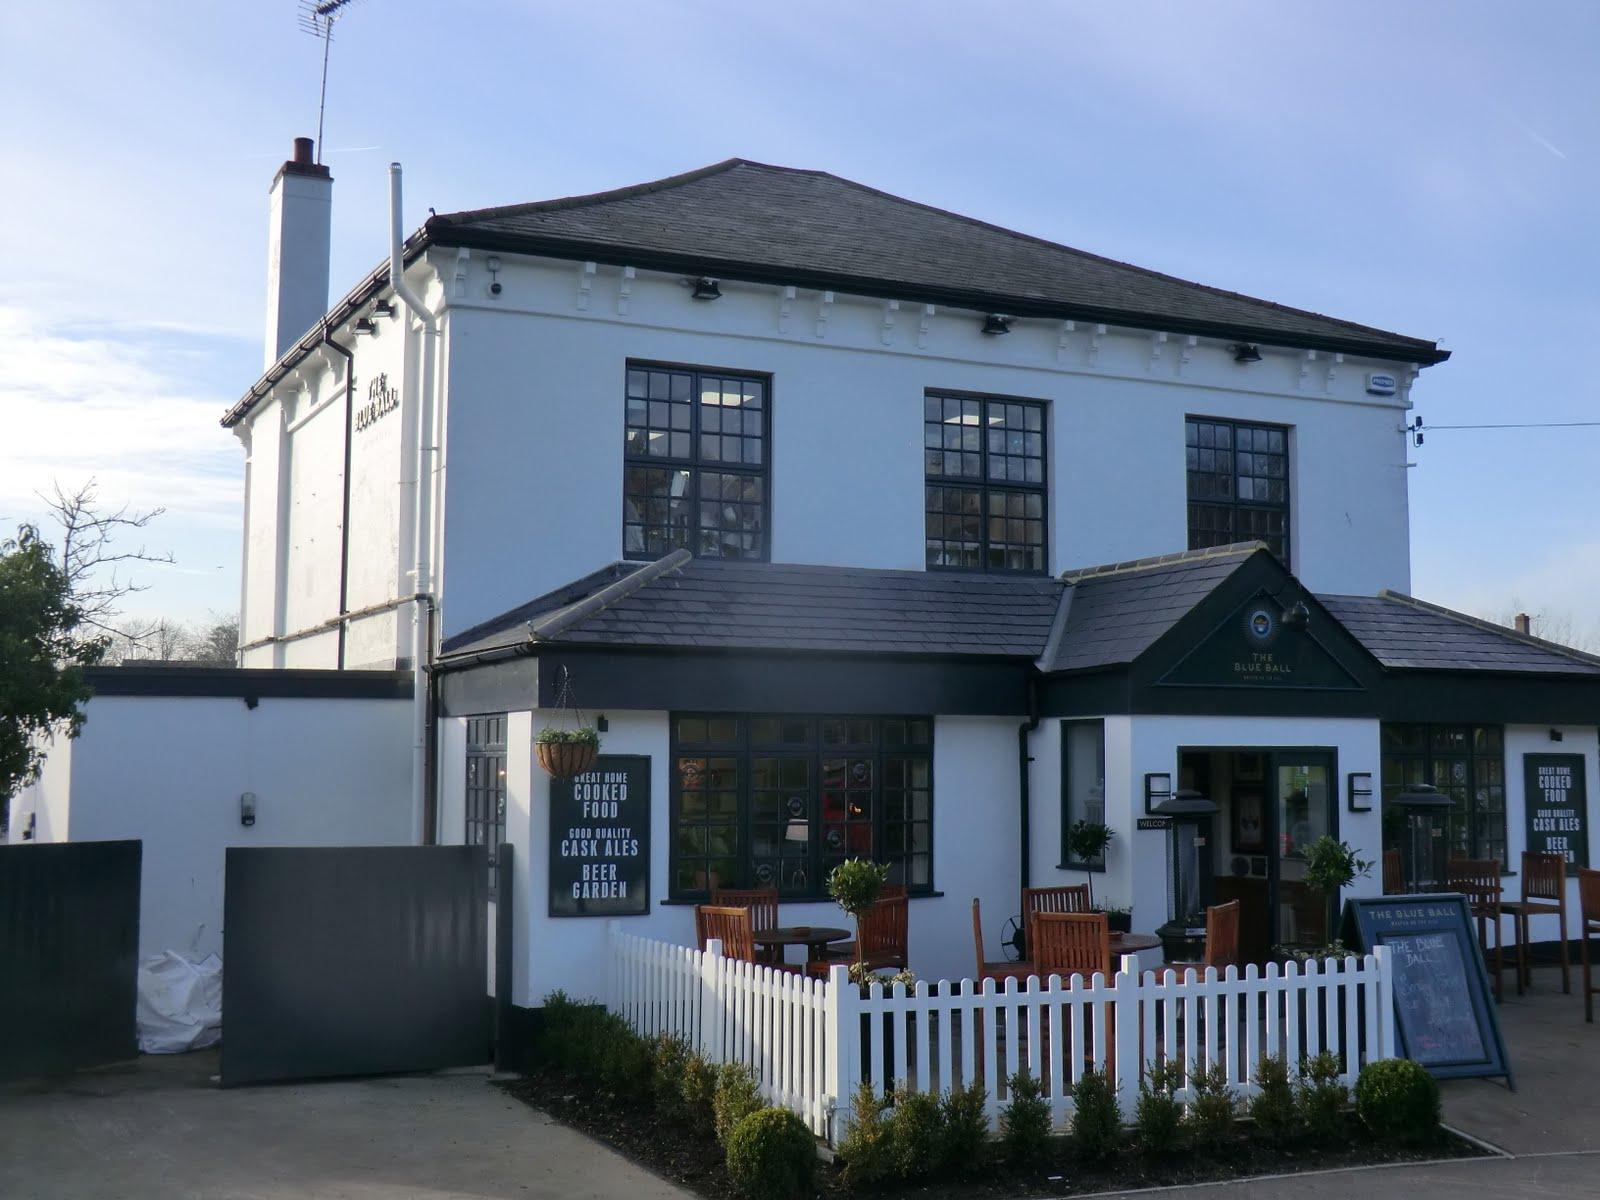 CIMG2221 The Blue Ball pub, Walton on the Hill